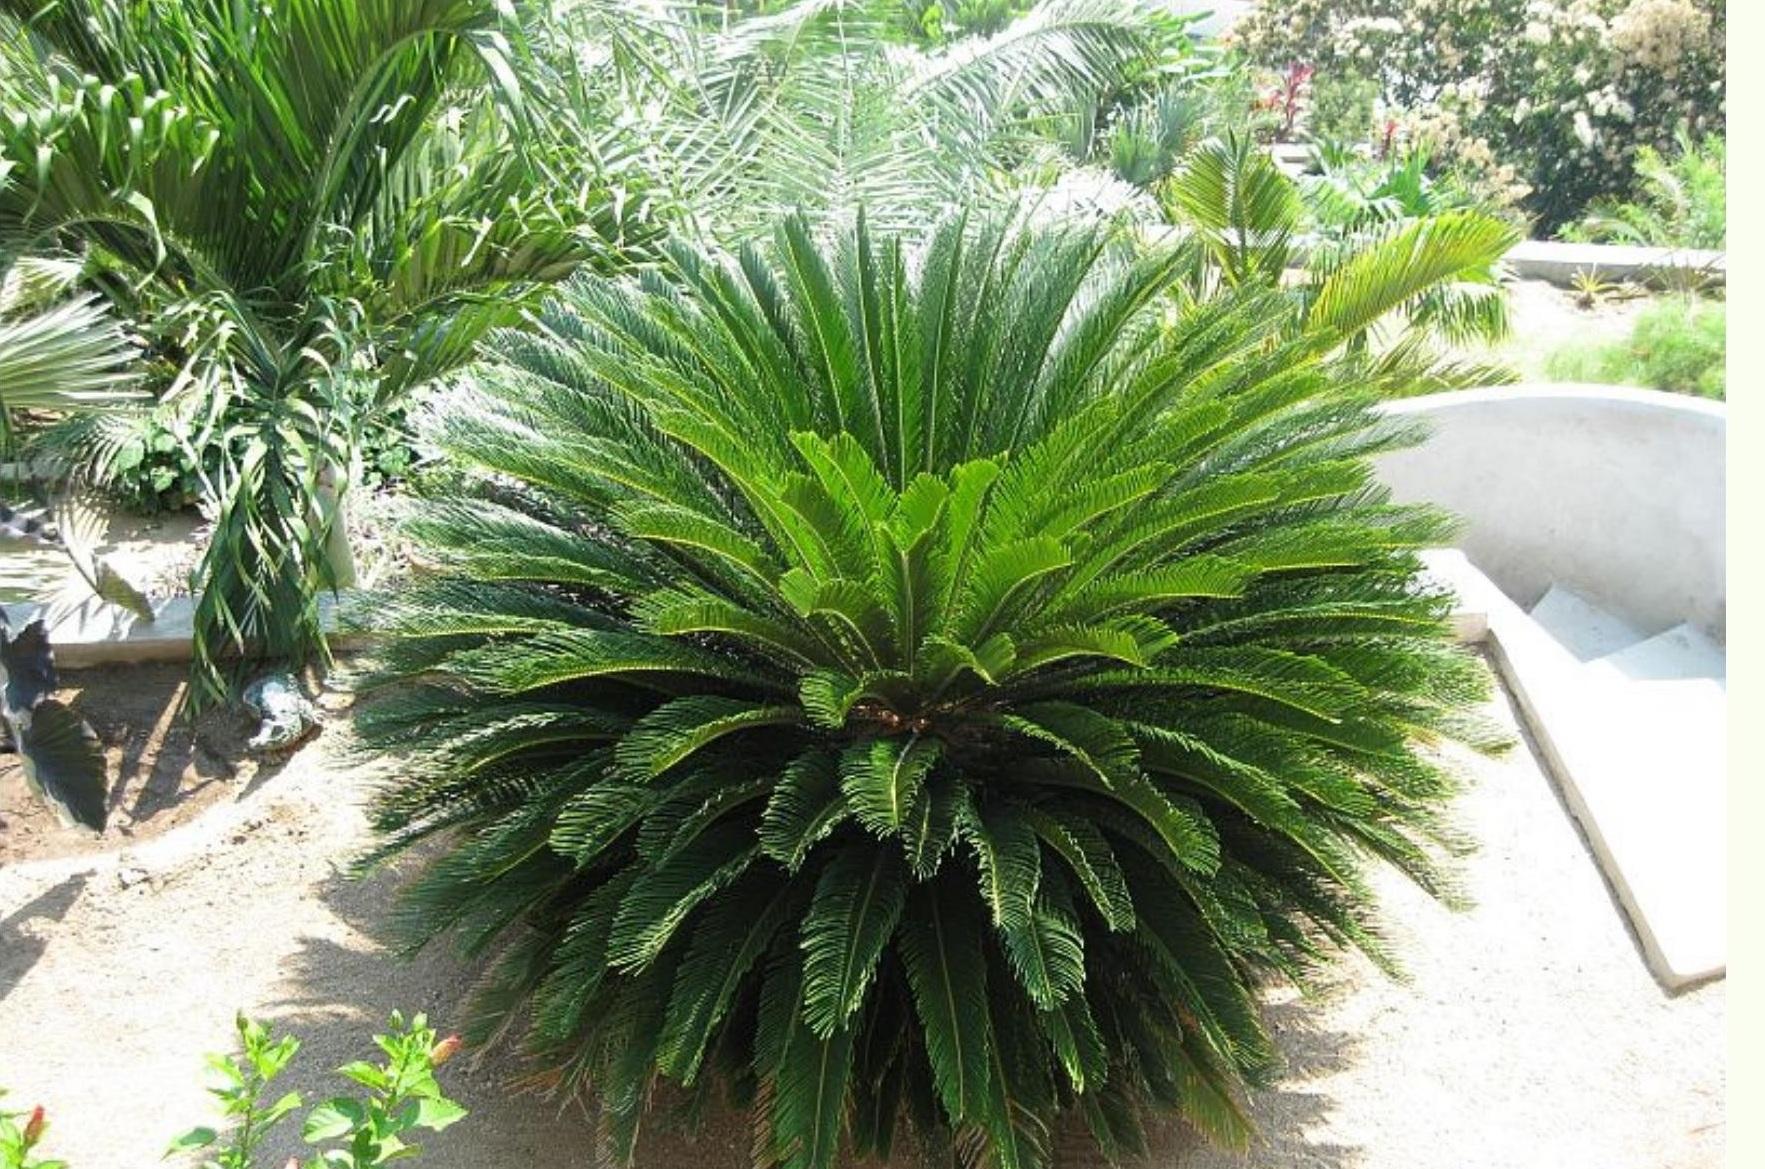 Sago Palm I Planted Roots In Mexico Manzanillo Sun